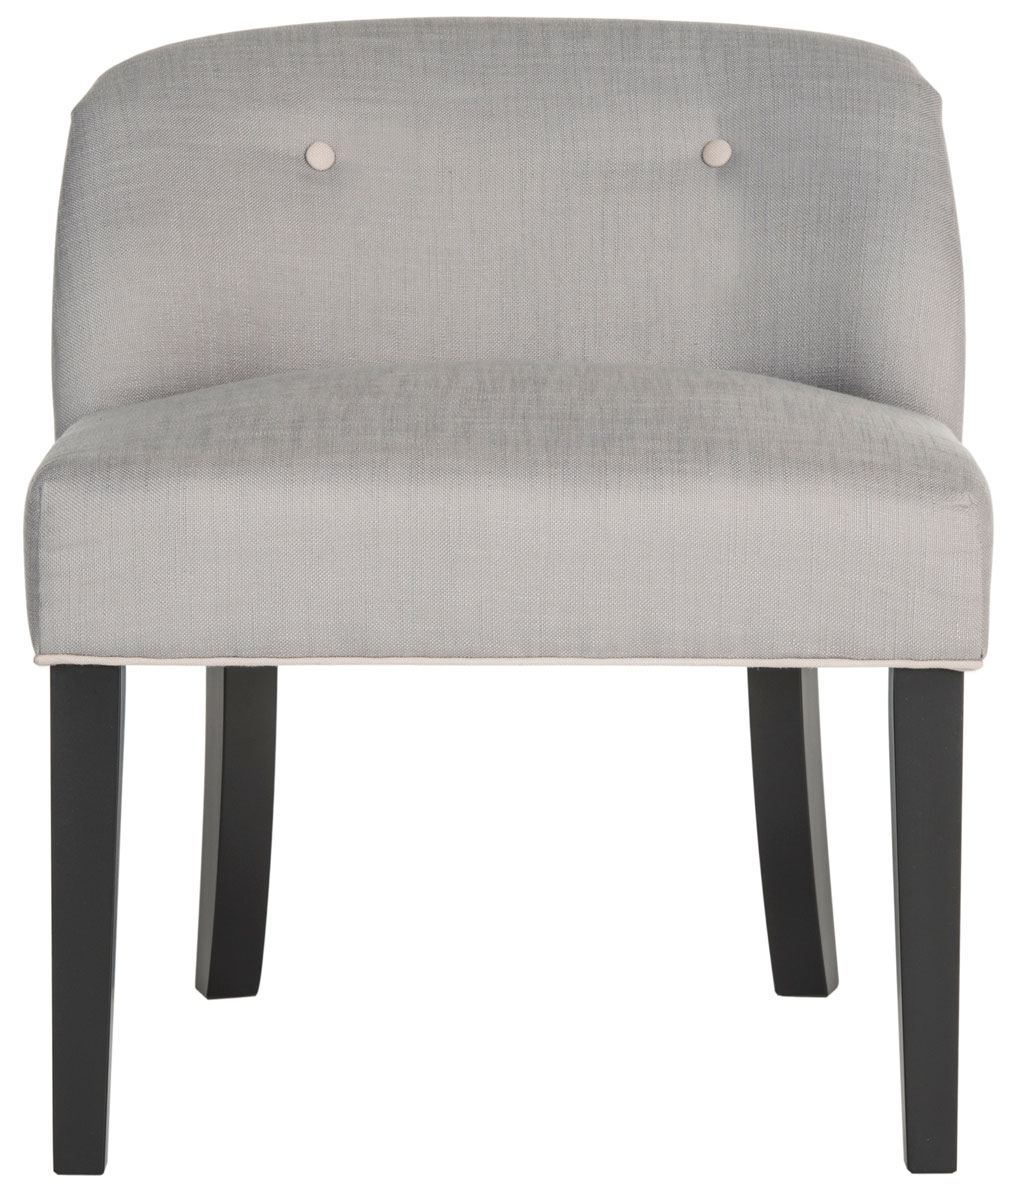 mcr4203b vanity stools furniture by safavieh